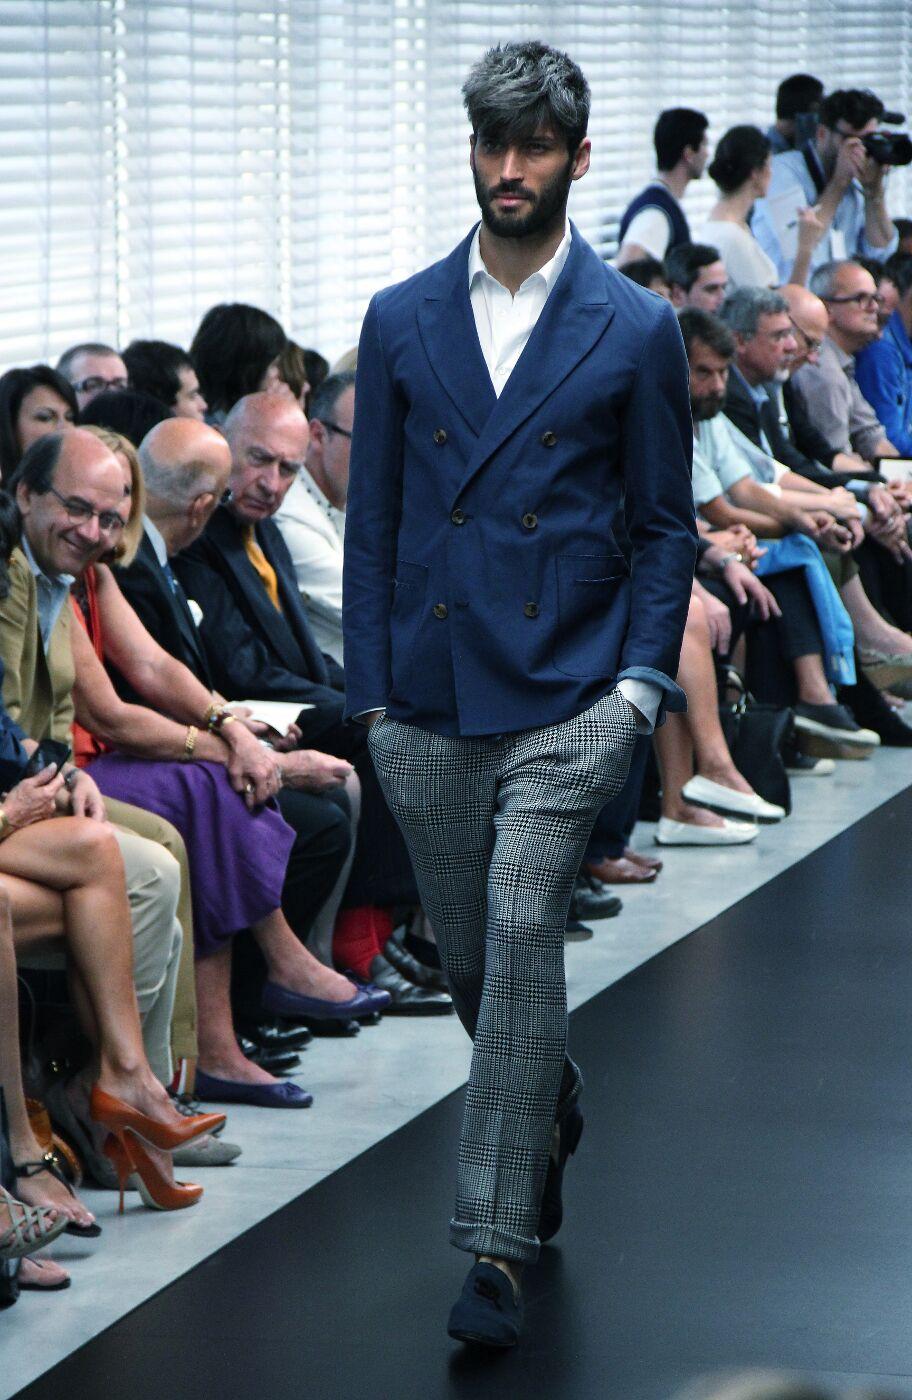 ermanno-scervino-spring-summer-2012-men-collection-milano-fashion-week-2012-ermanno-scervino-primavera-estate-ermanno-scervino-fashion-show-catwalk